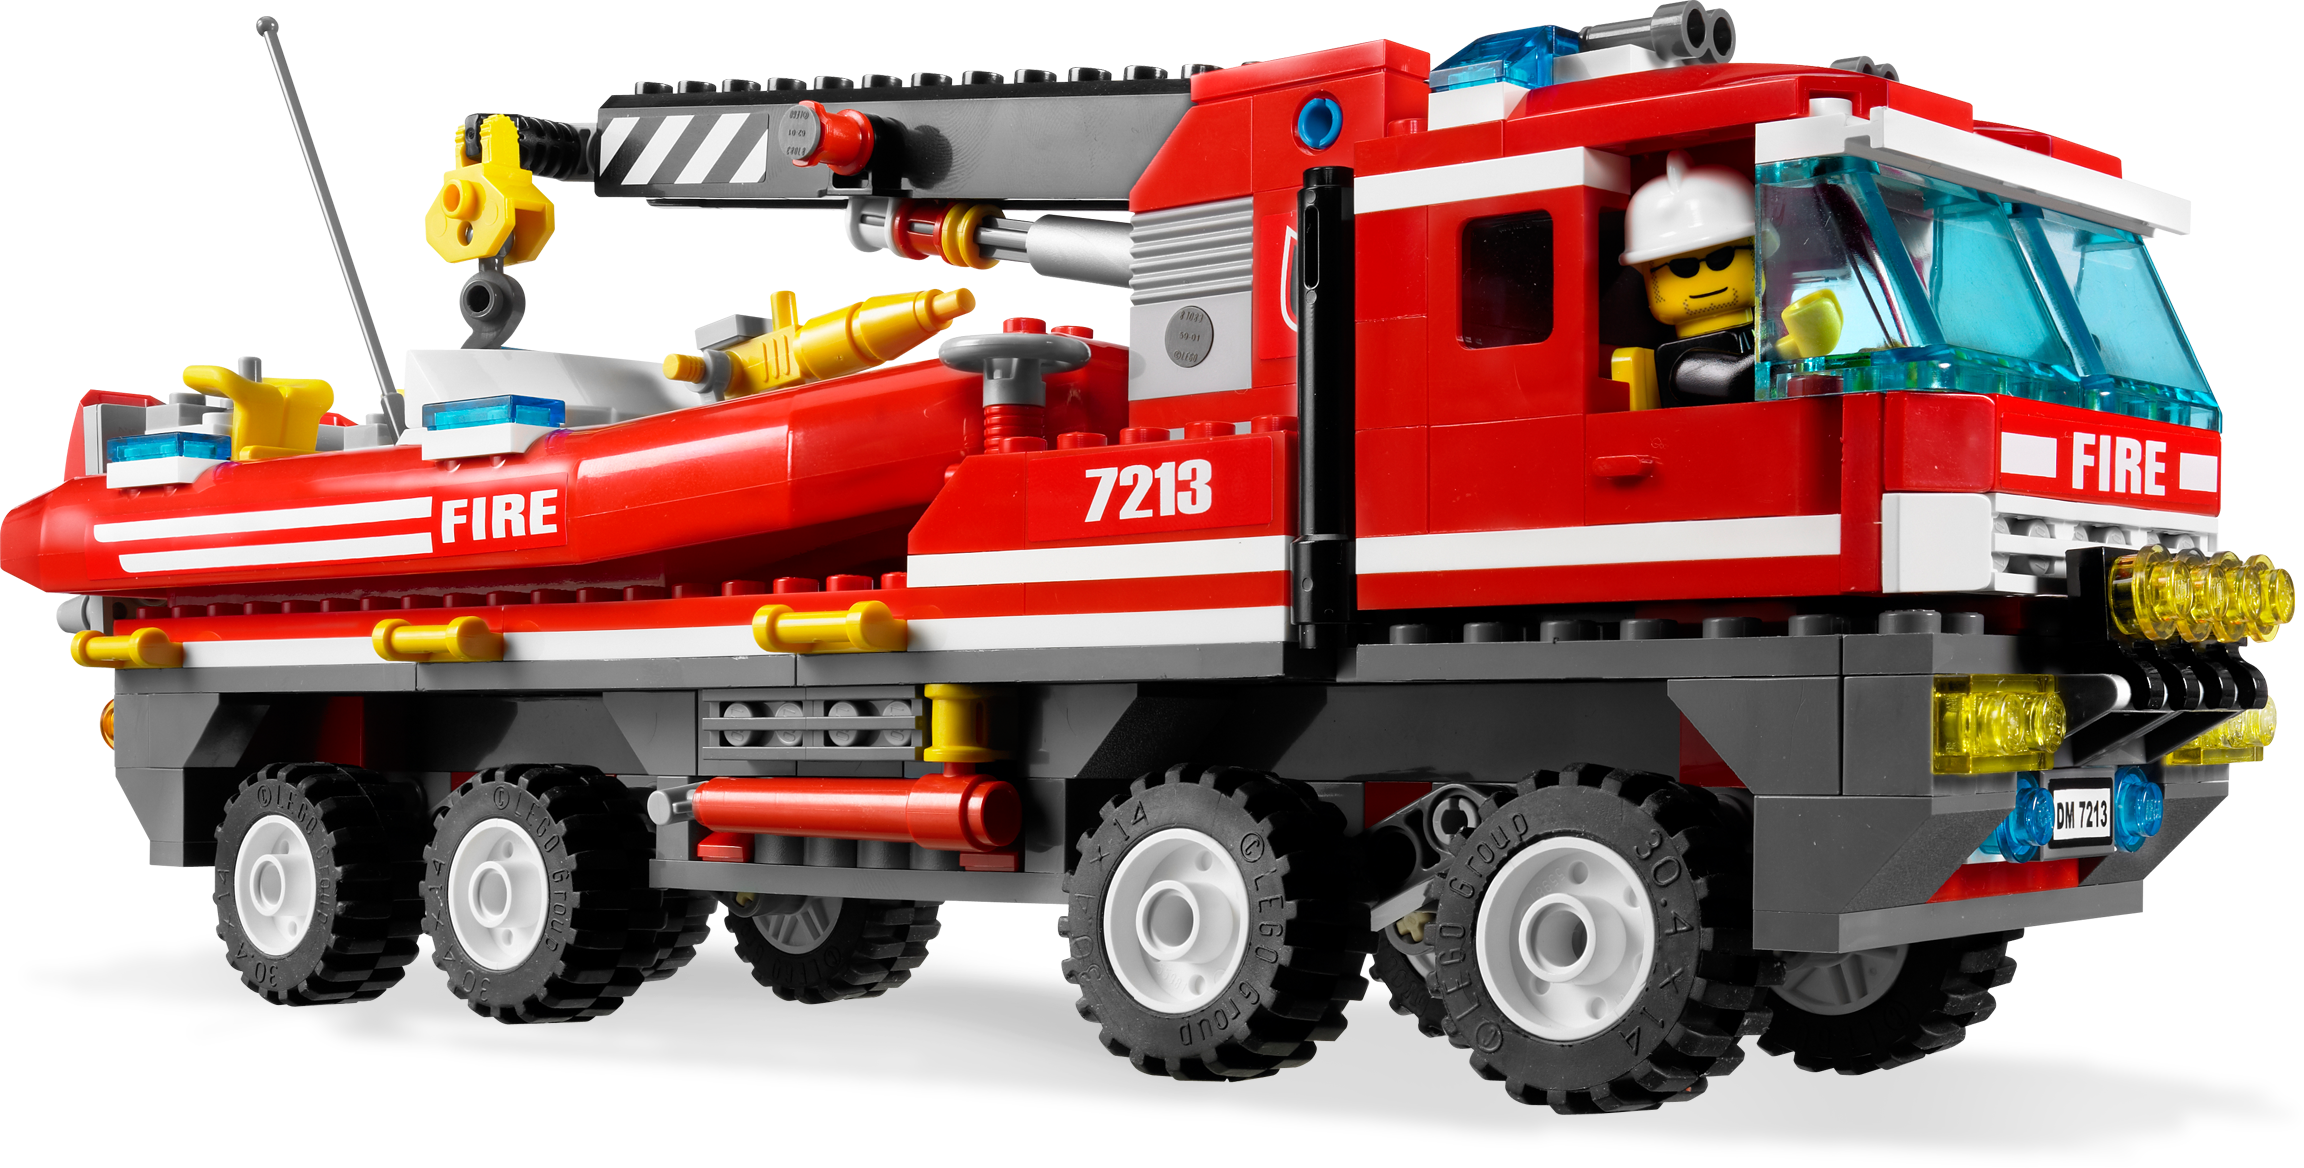 Off-Road Fire Truck & Fireboat